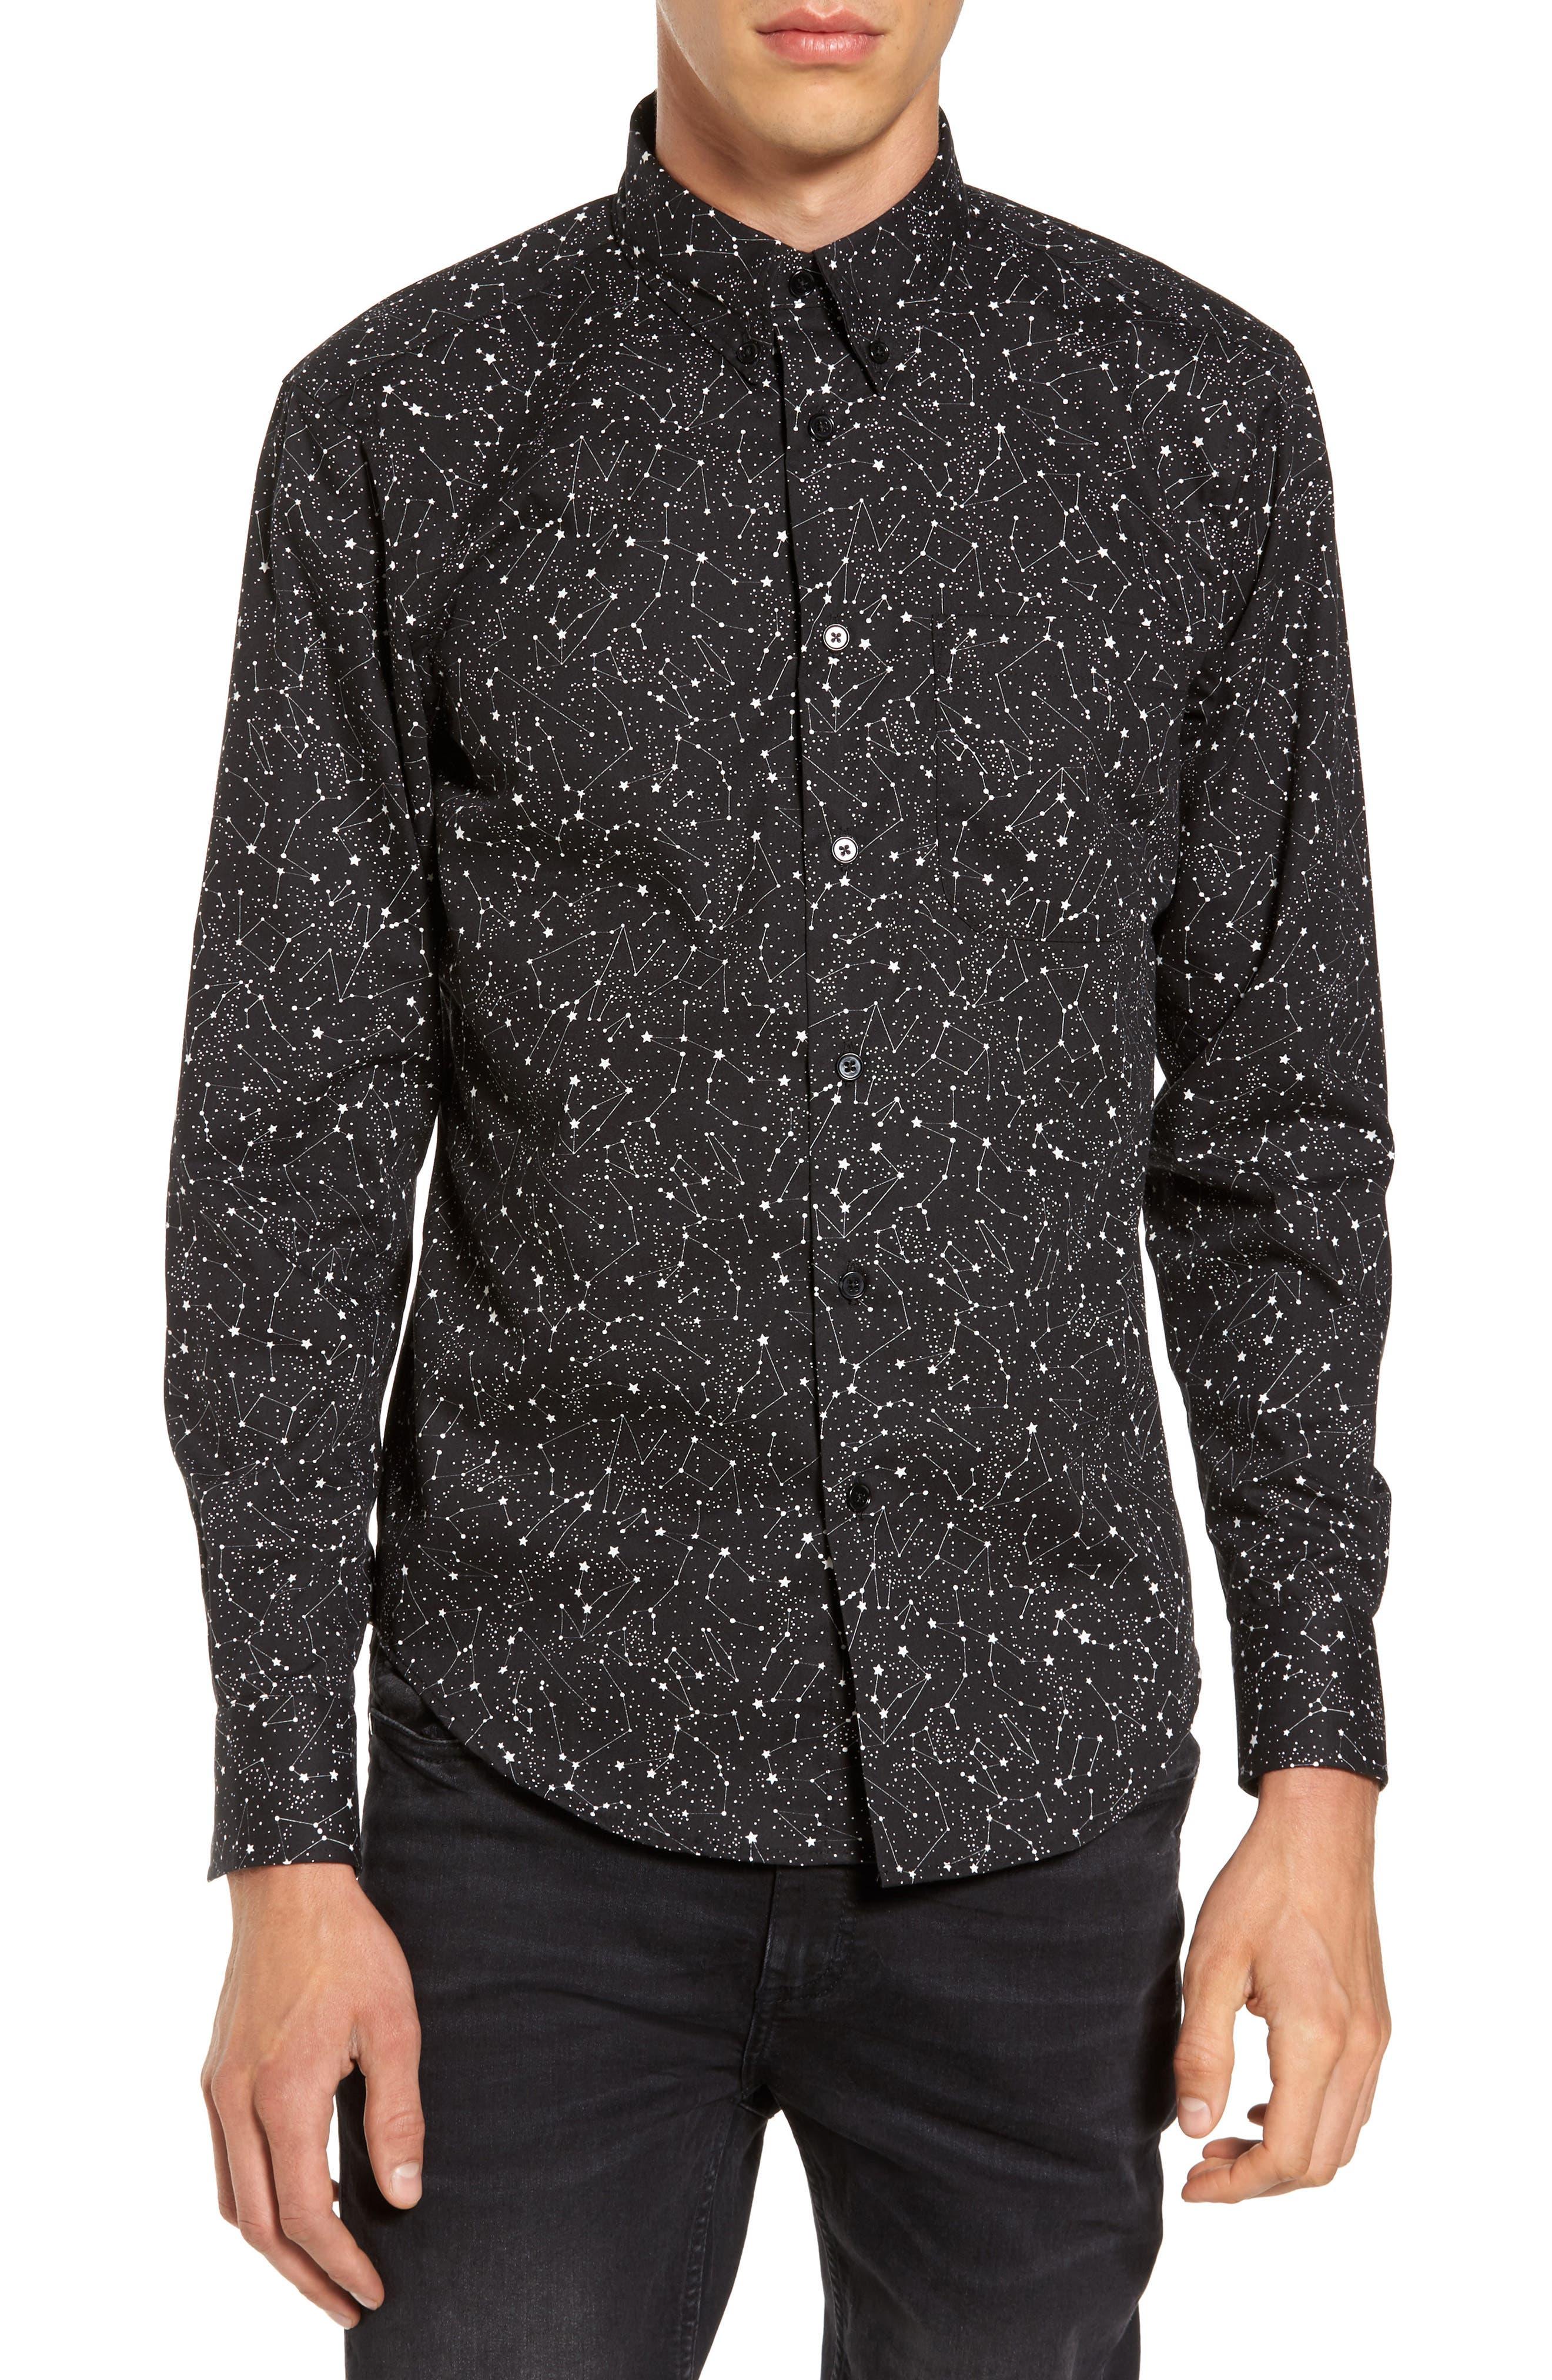 Main Image - Naked & Famous Denim Constellations Shirt